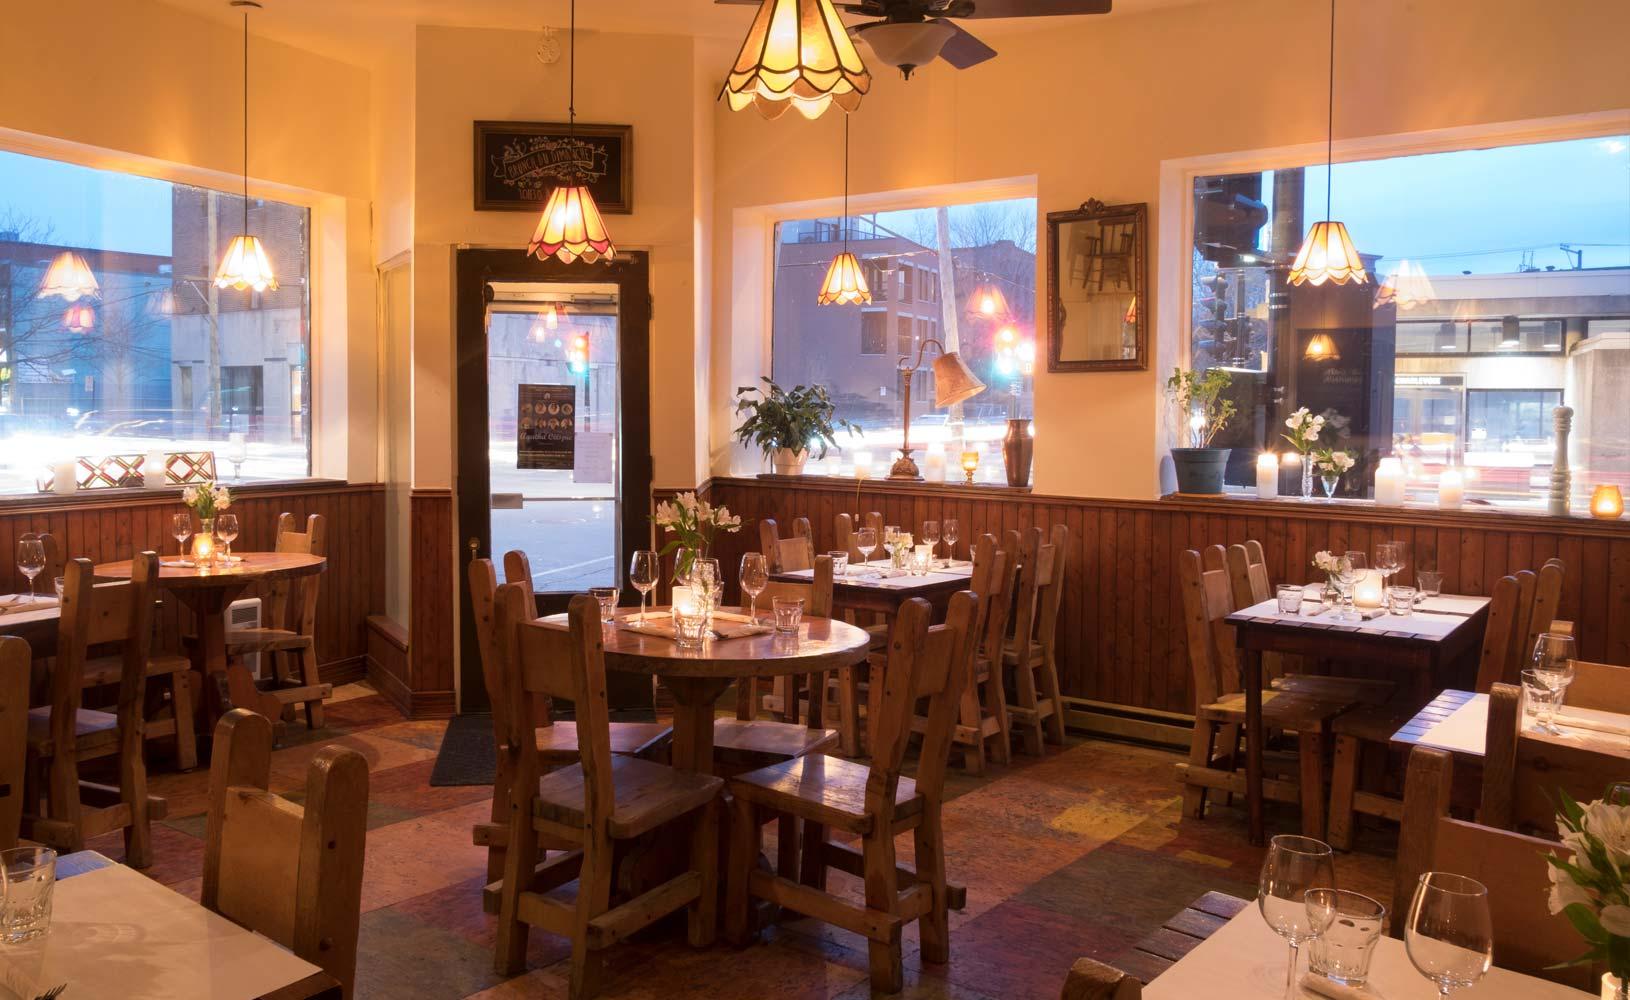 restaurant-machiavelli-cuisine-de-marche-pointe-st-charles-montreal-salle-principale.jpg